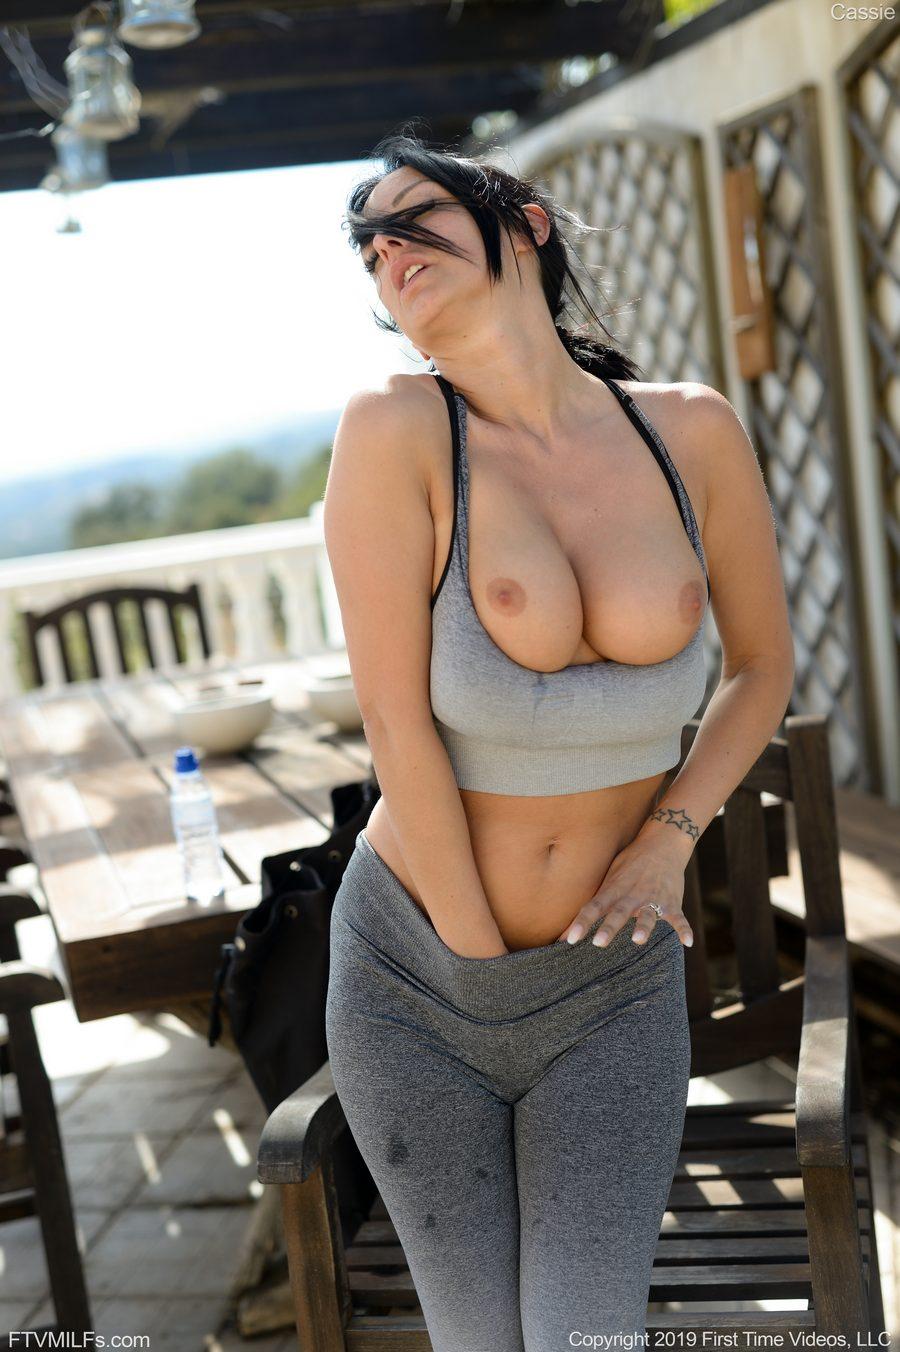 Ftvmilfs cassie clarke jada milf longest saggy yes porn pics xxx